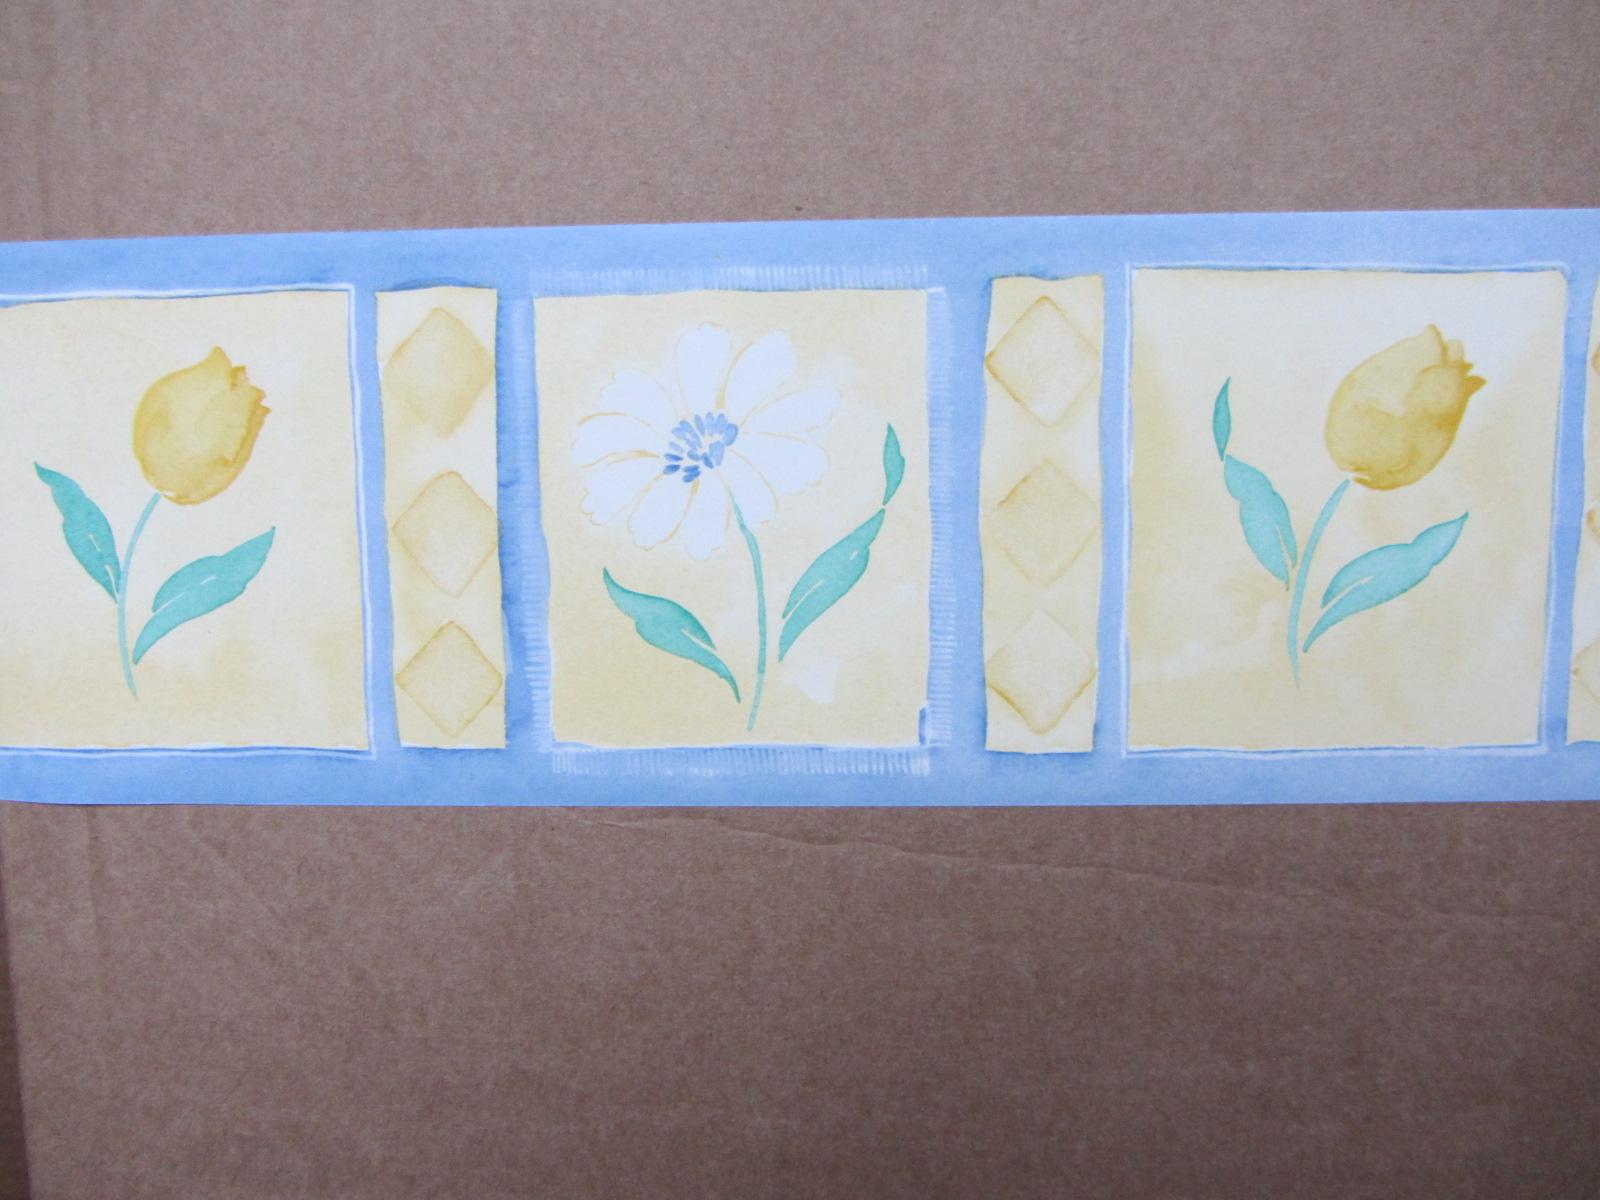 CASCADE BLUE WALLPAPER BORDER SELF ADHESIVE BEDROOM LEMON YELLOW 5 x 1600x1200